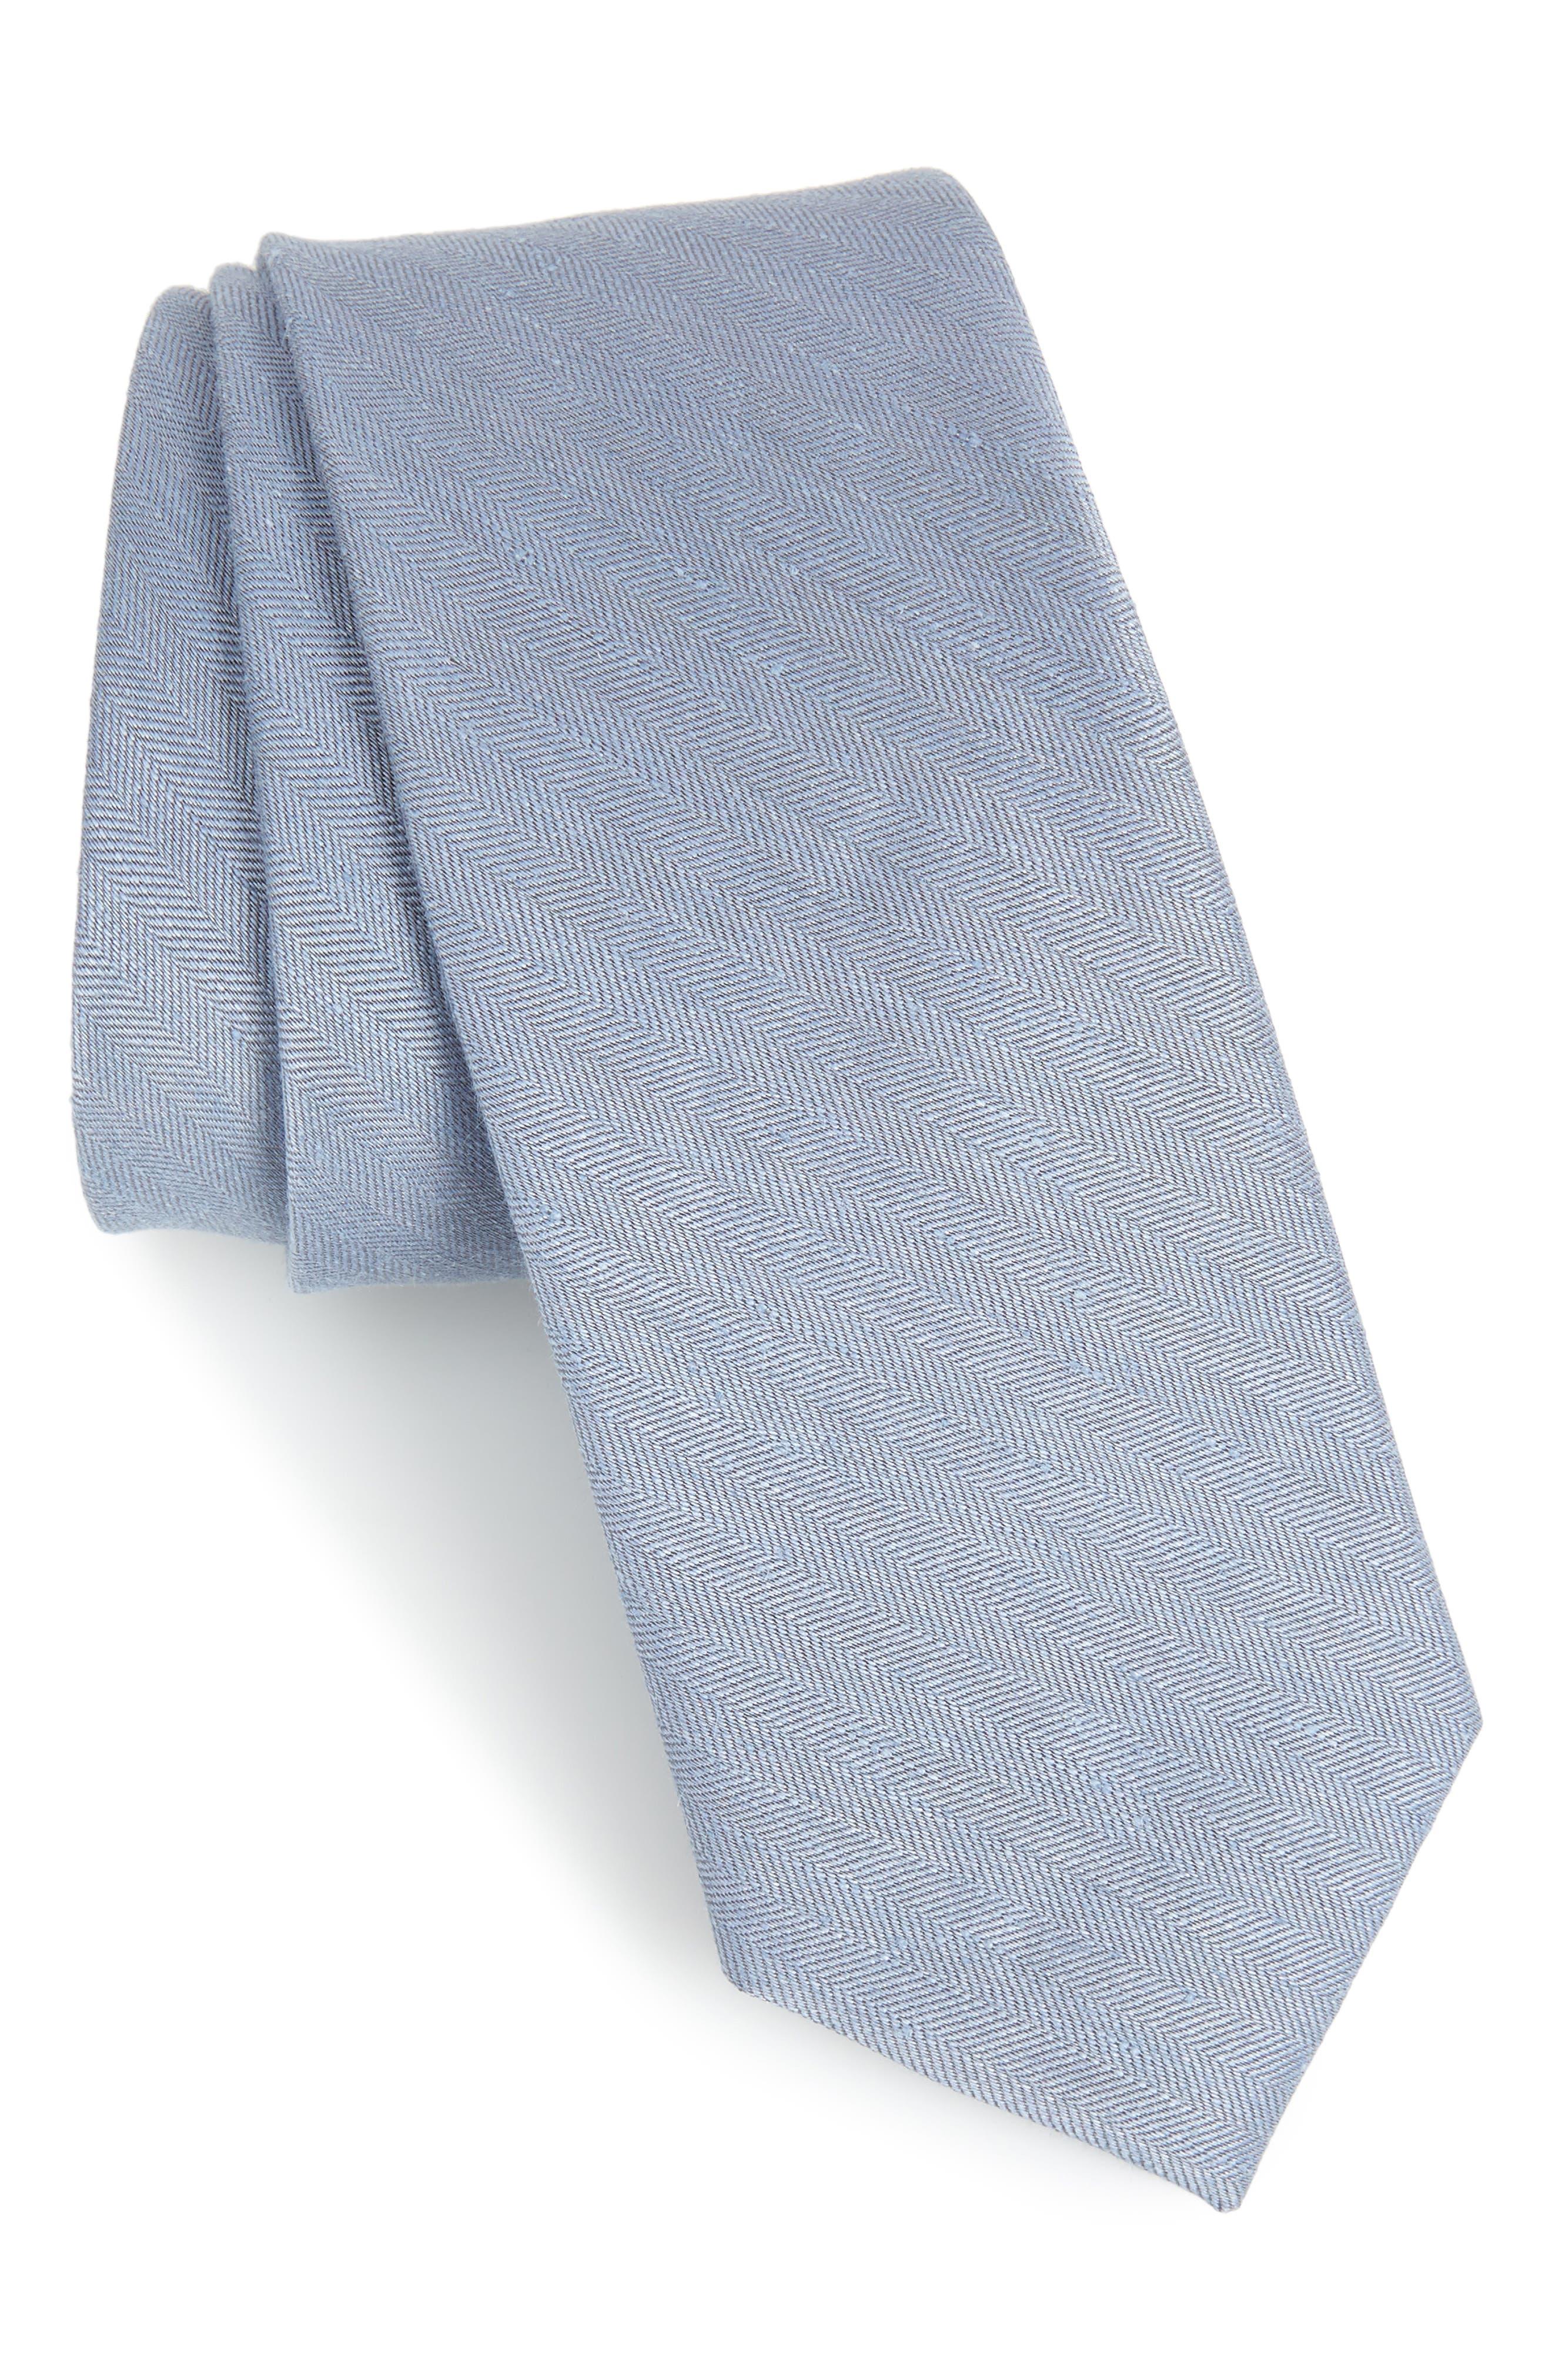 THE TIE BAR Herringbone Linen & Silk Skinny Tie, Main, color, SLATE